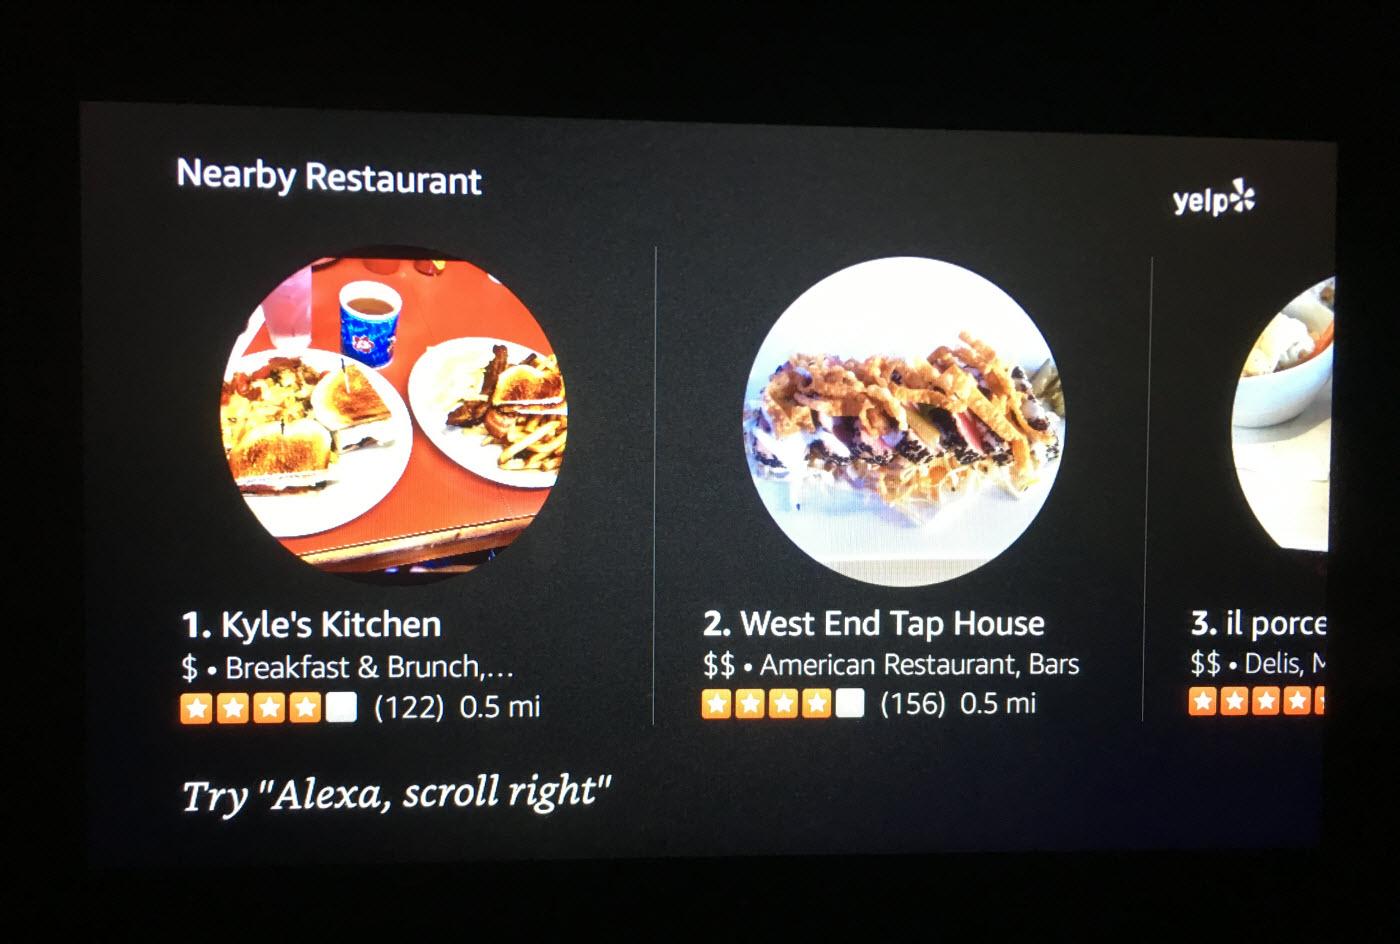 Echo Show interface